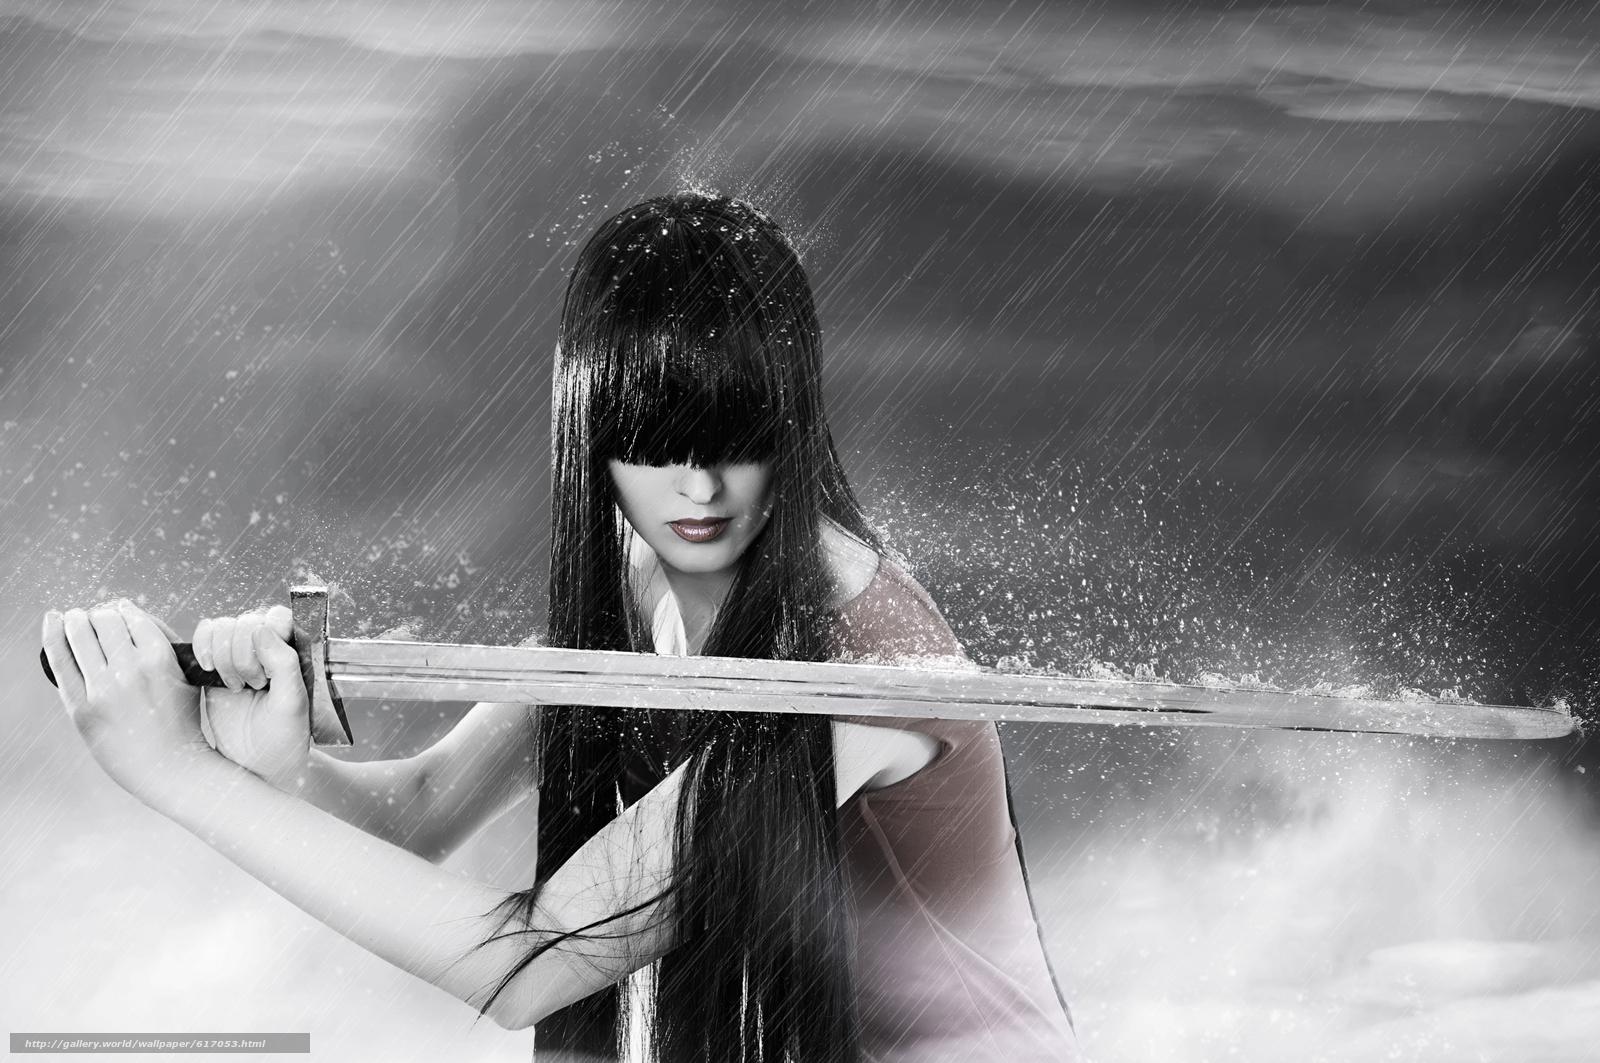 меч, дождь, девушка, брюнетка